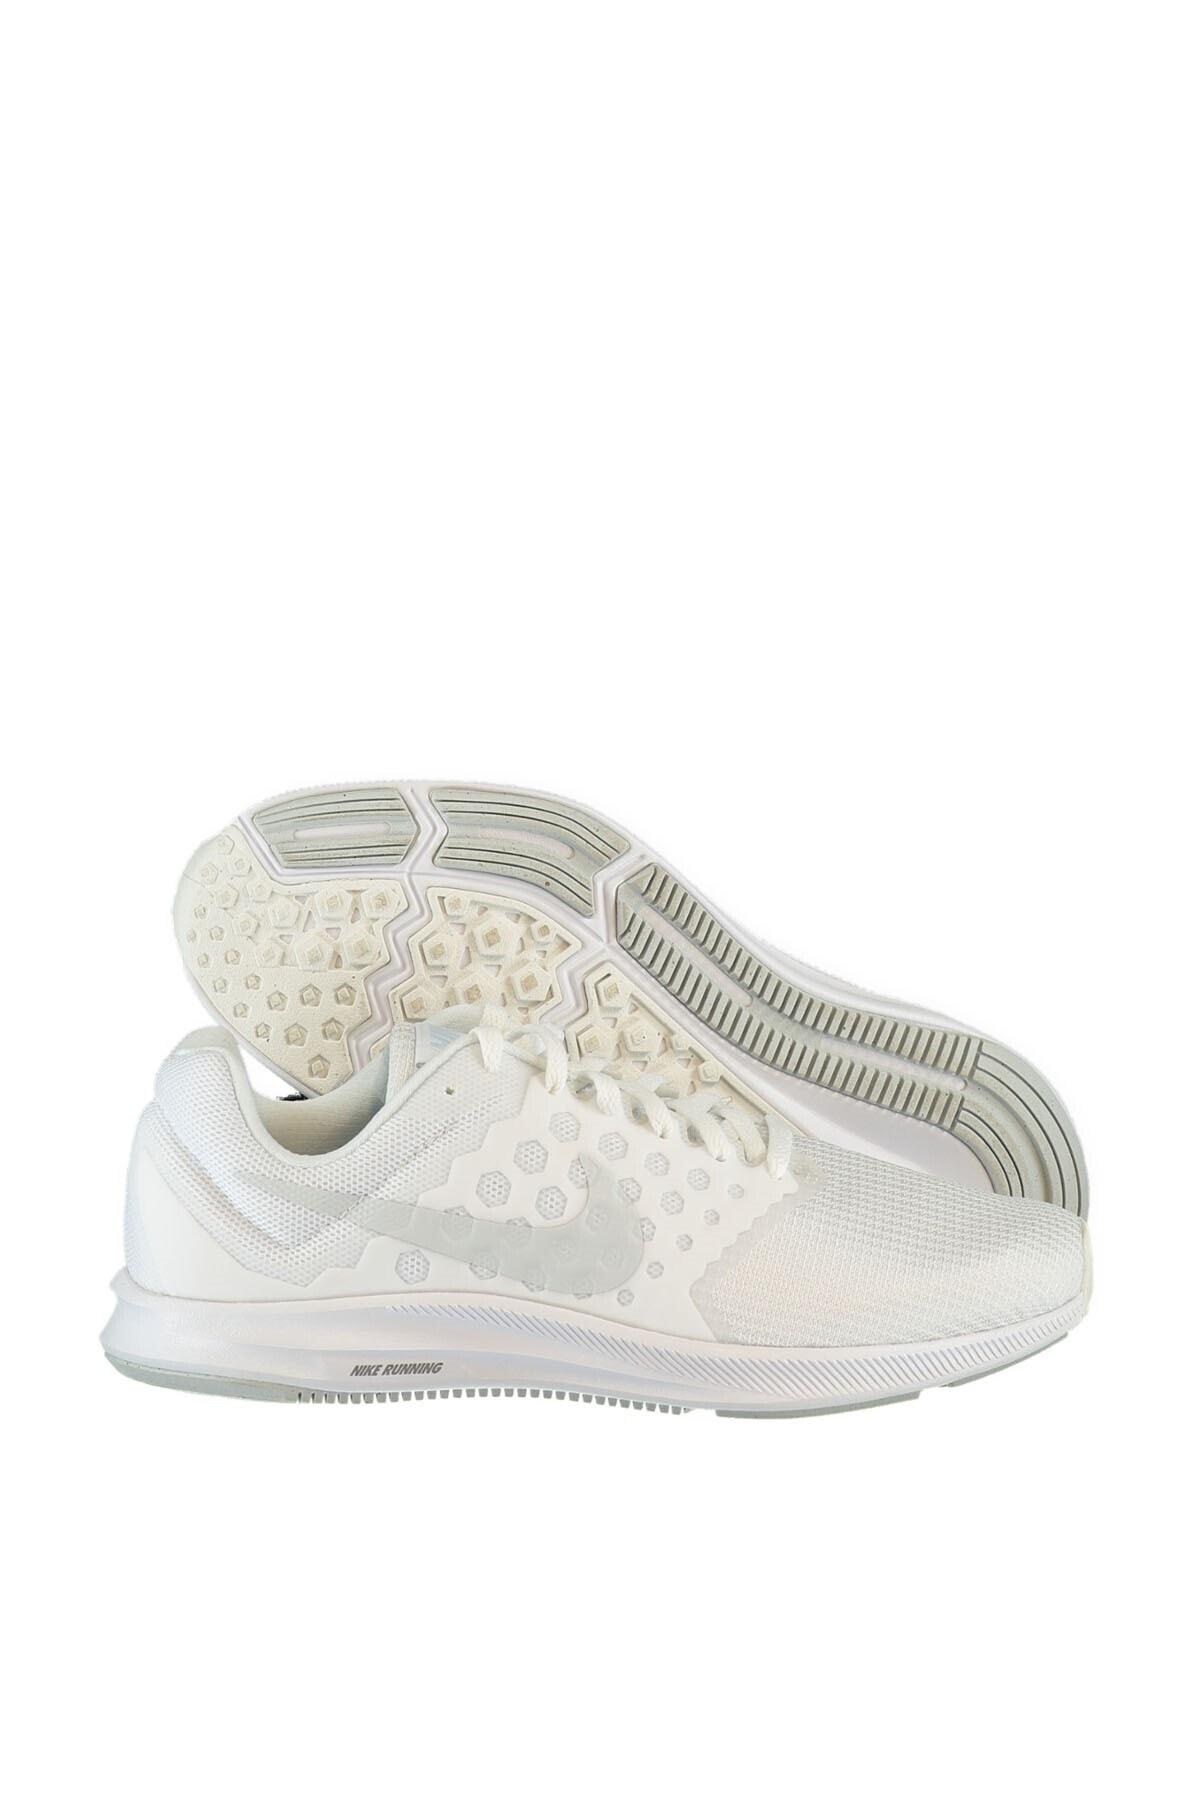 Nike Kadın Casual Ayakkabı - Wmns Downshifter 7 - 852466-100 1